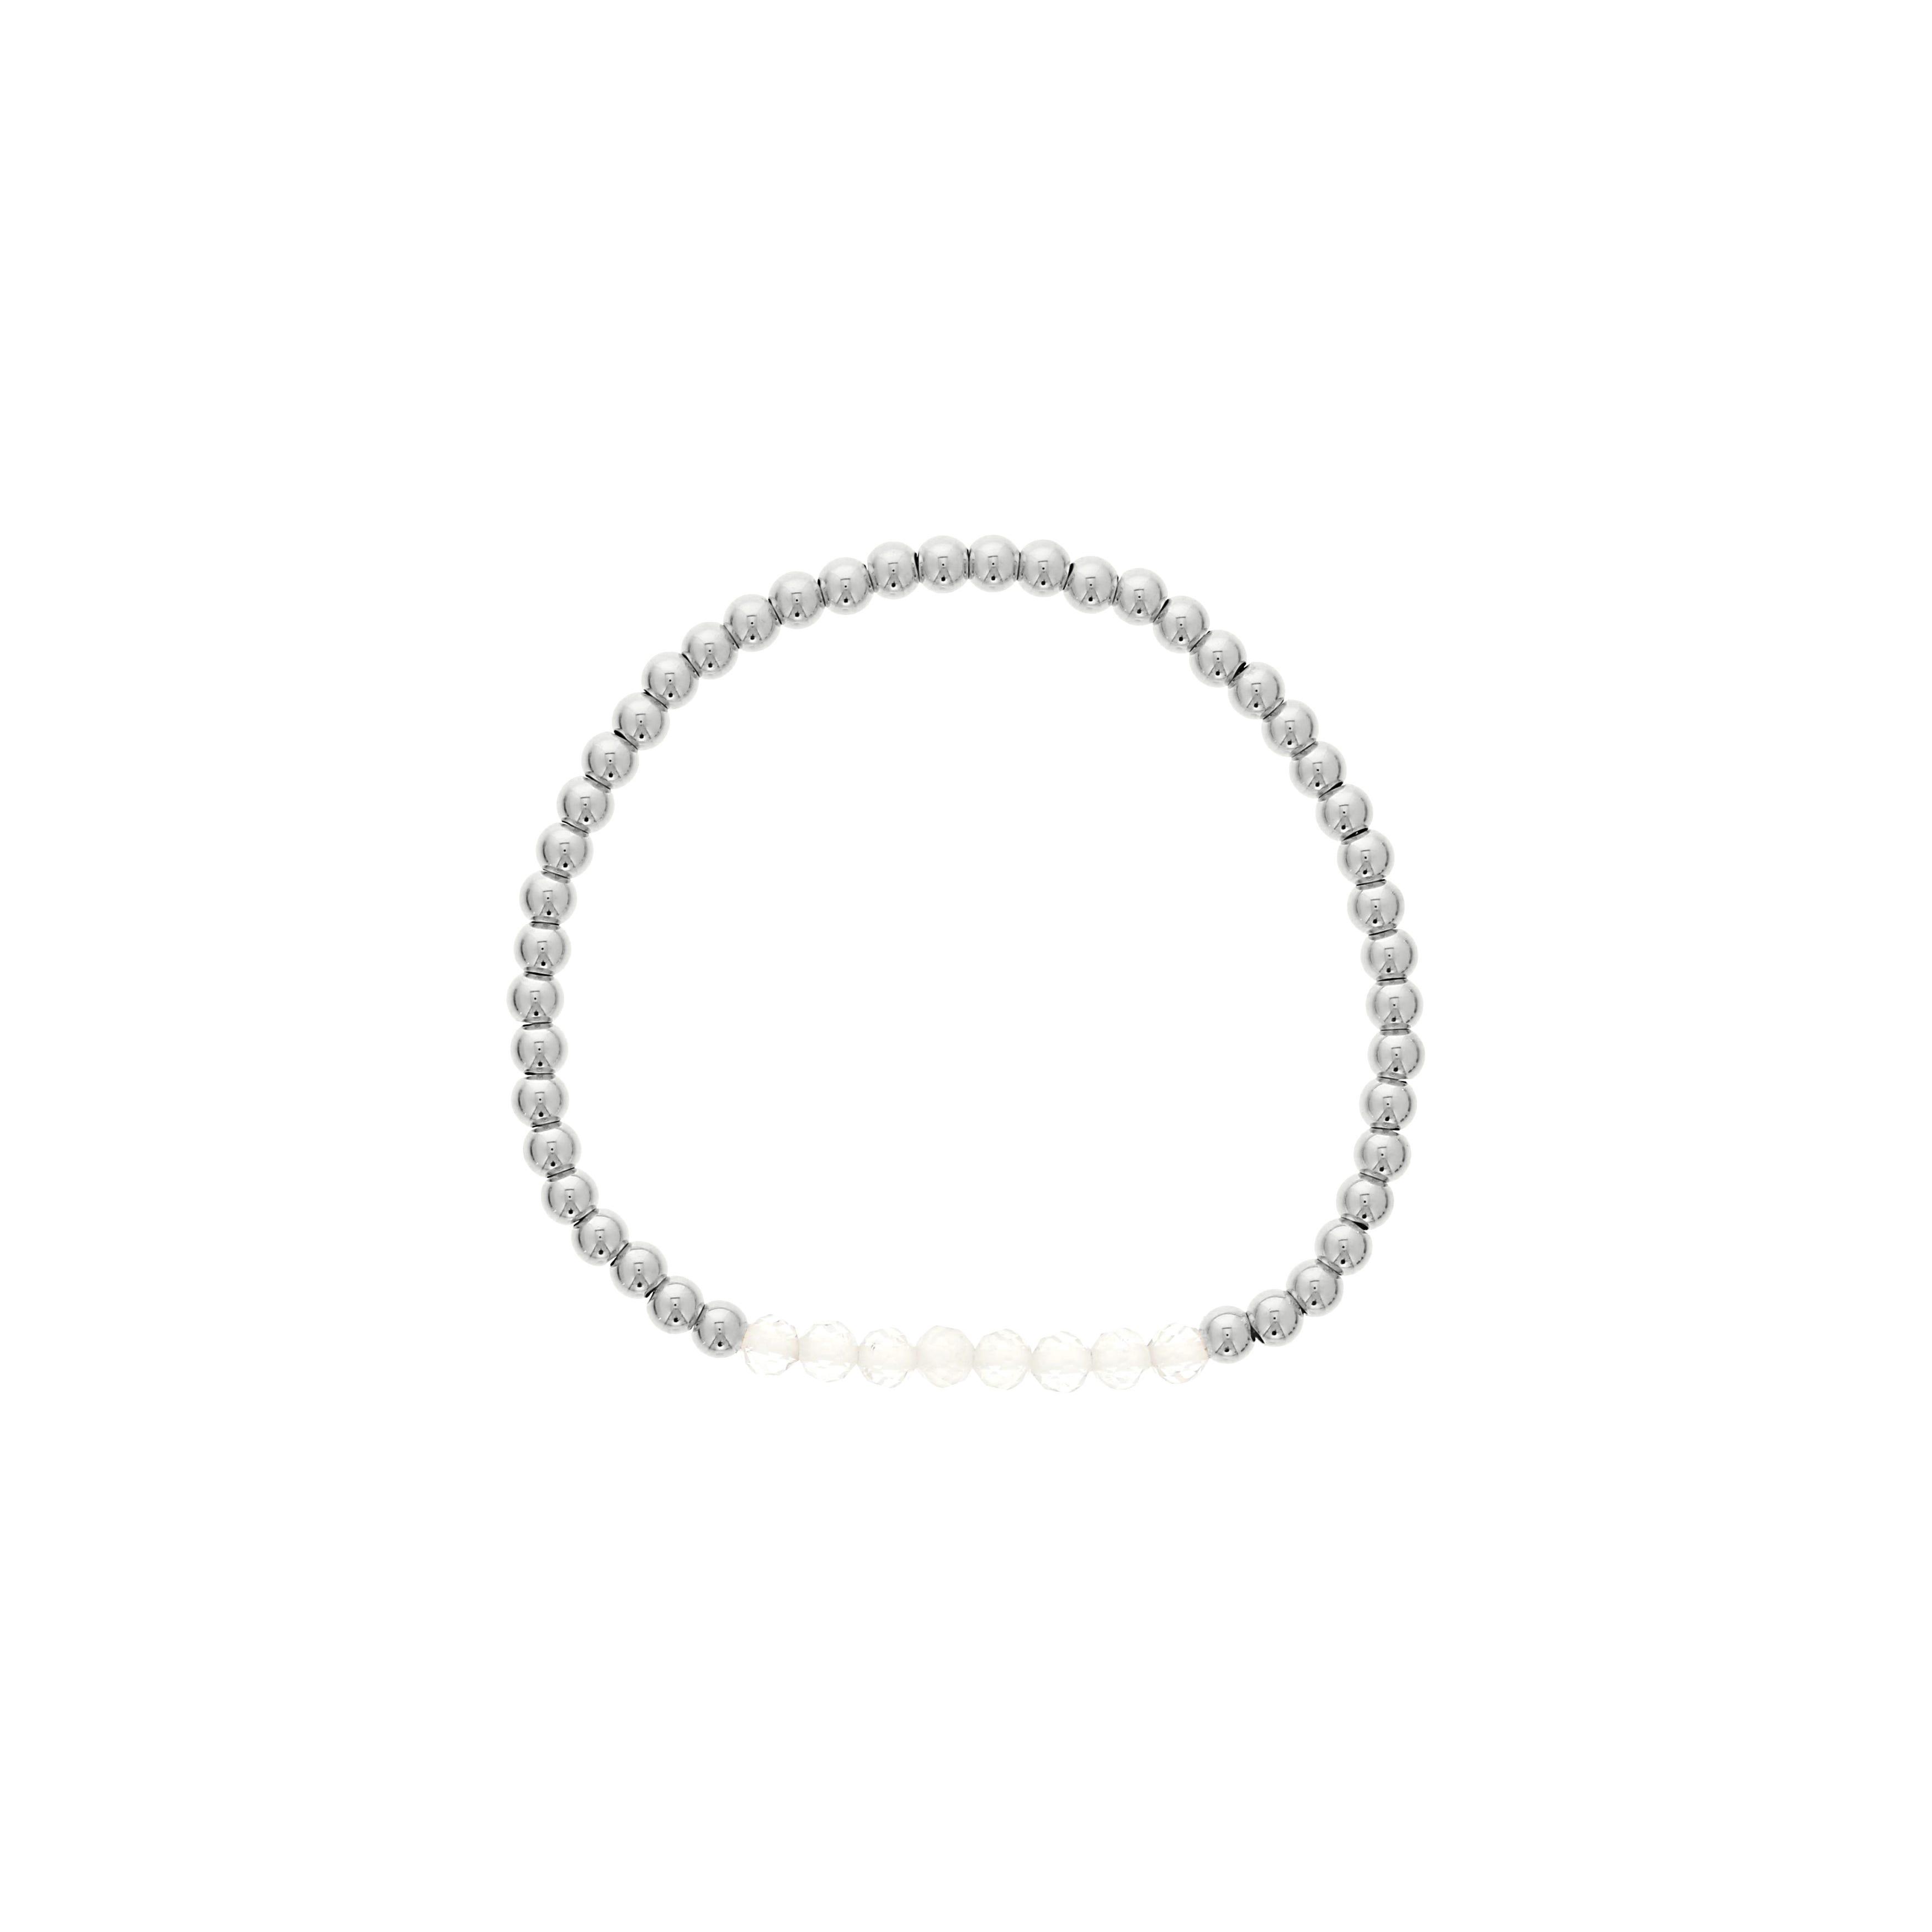 Clear Quartz Birthstone Beaded Bracelet in Sterling Silver